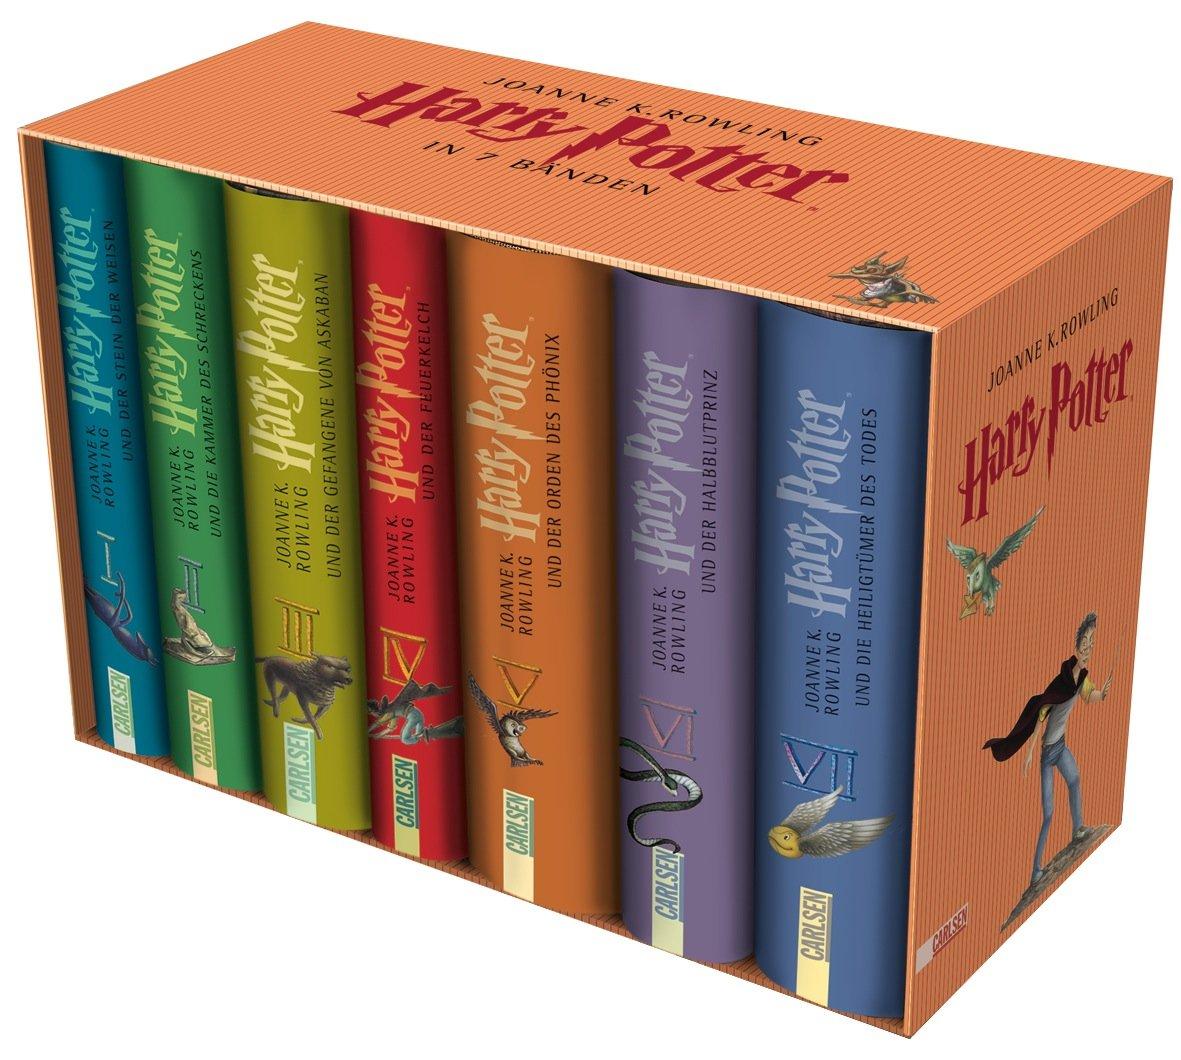 Harry Potter: 7 Bände im Schuber Gebundenes Buch – 25. September 2008 Joanne K. Rowling Klaus Fritz Carlsen 3551555532